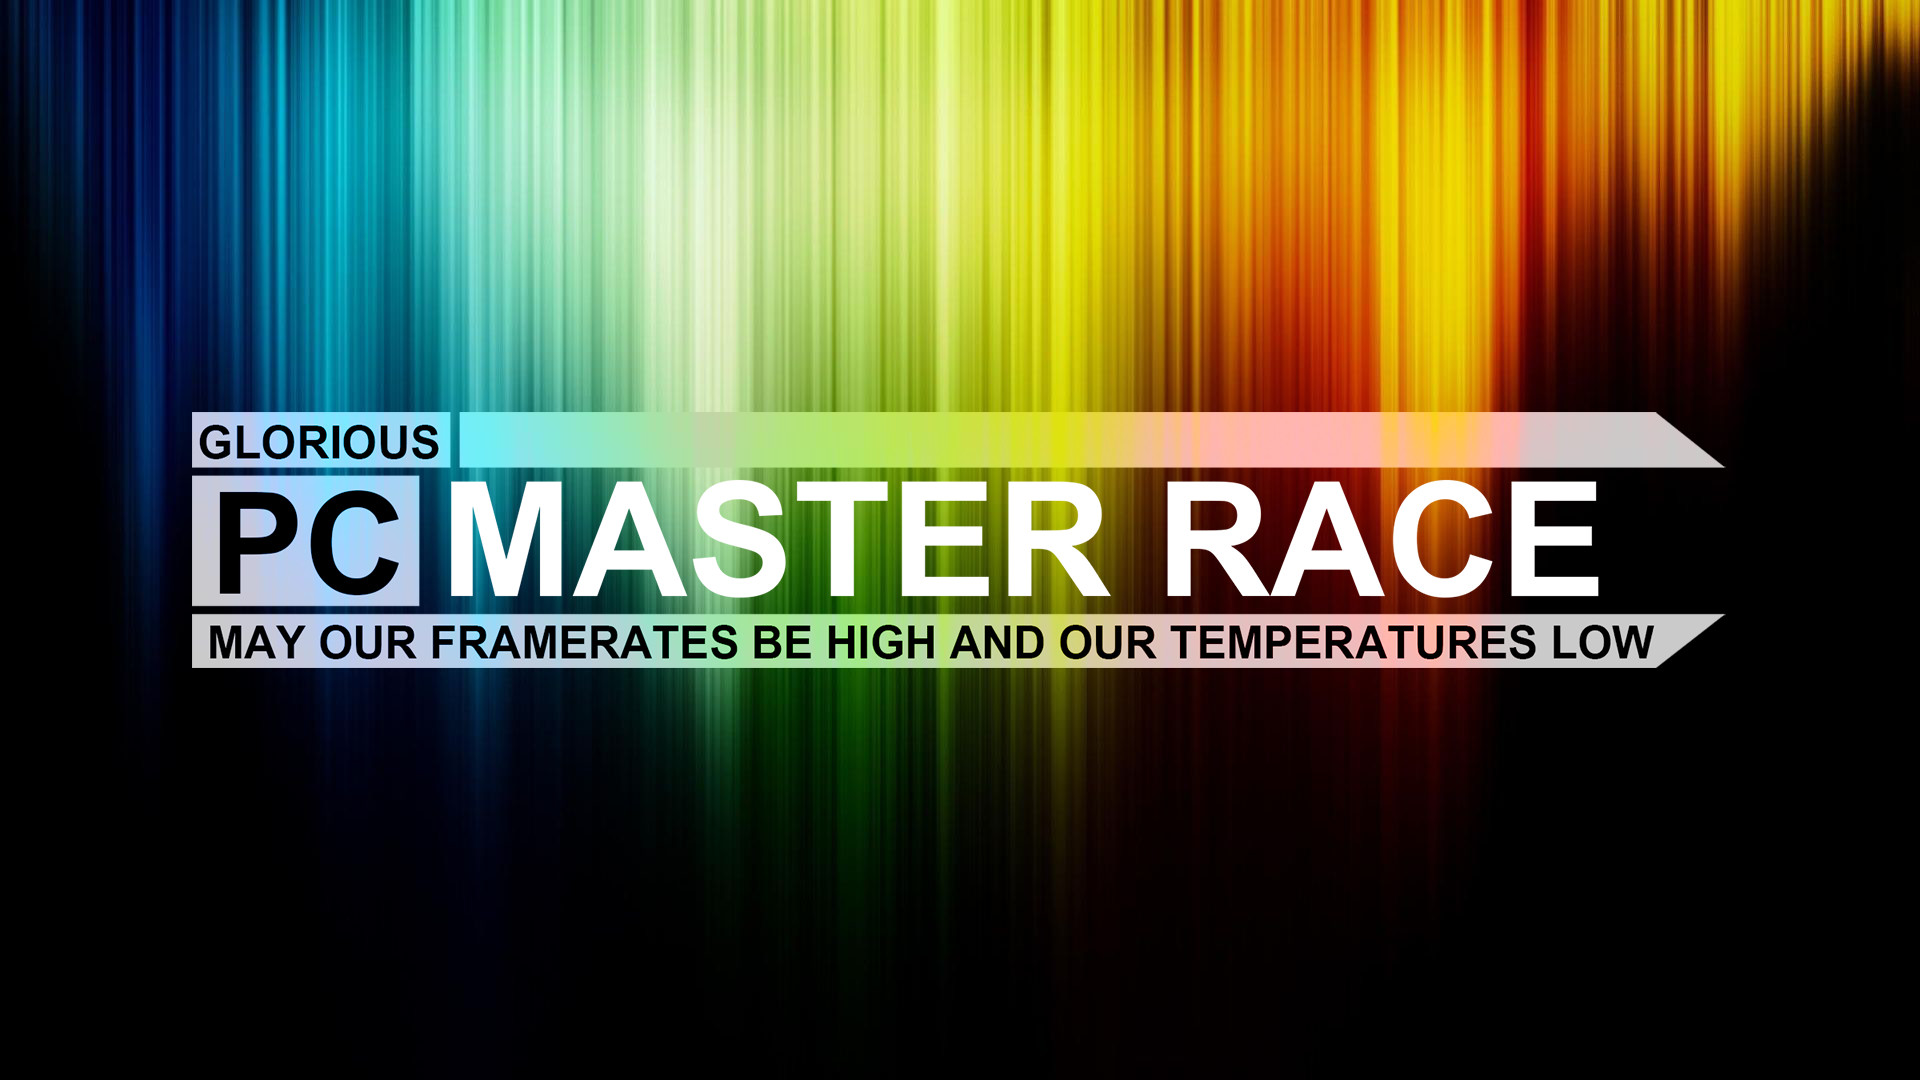 Glorious PC Master Race Wallpaper | Alienware Arena